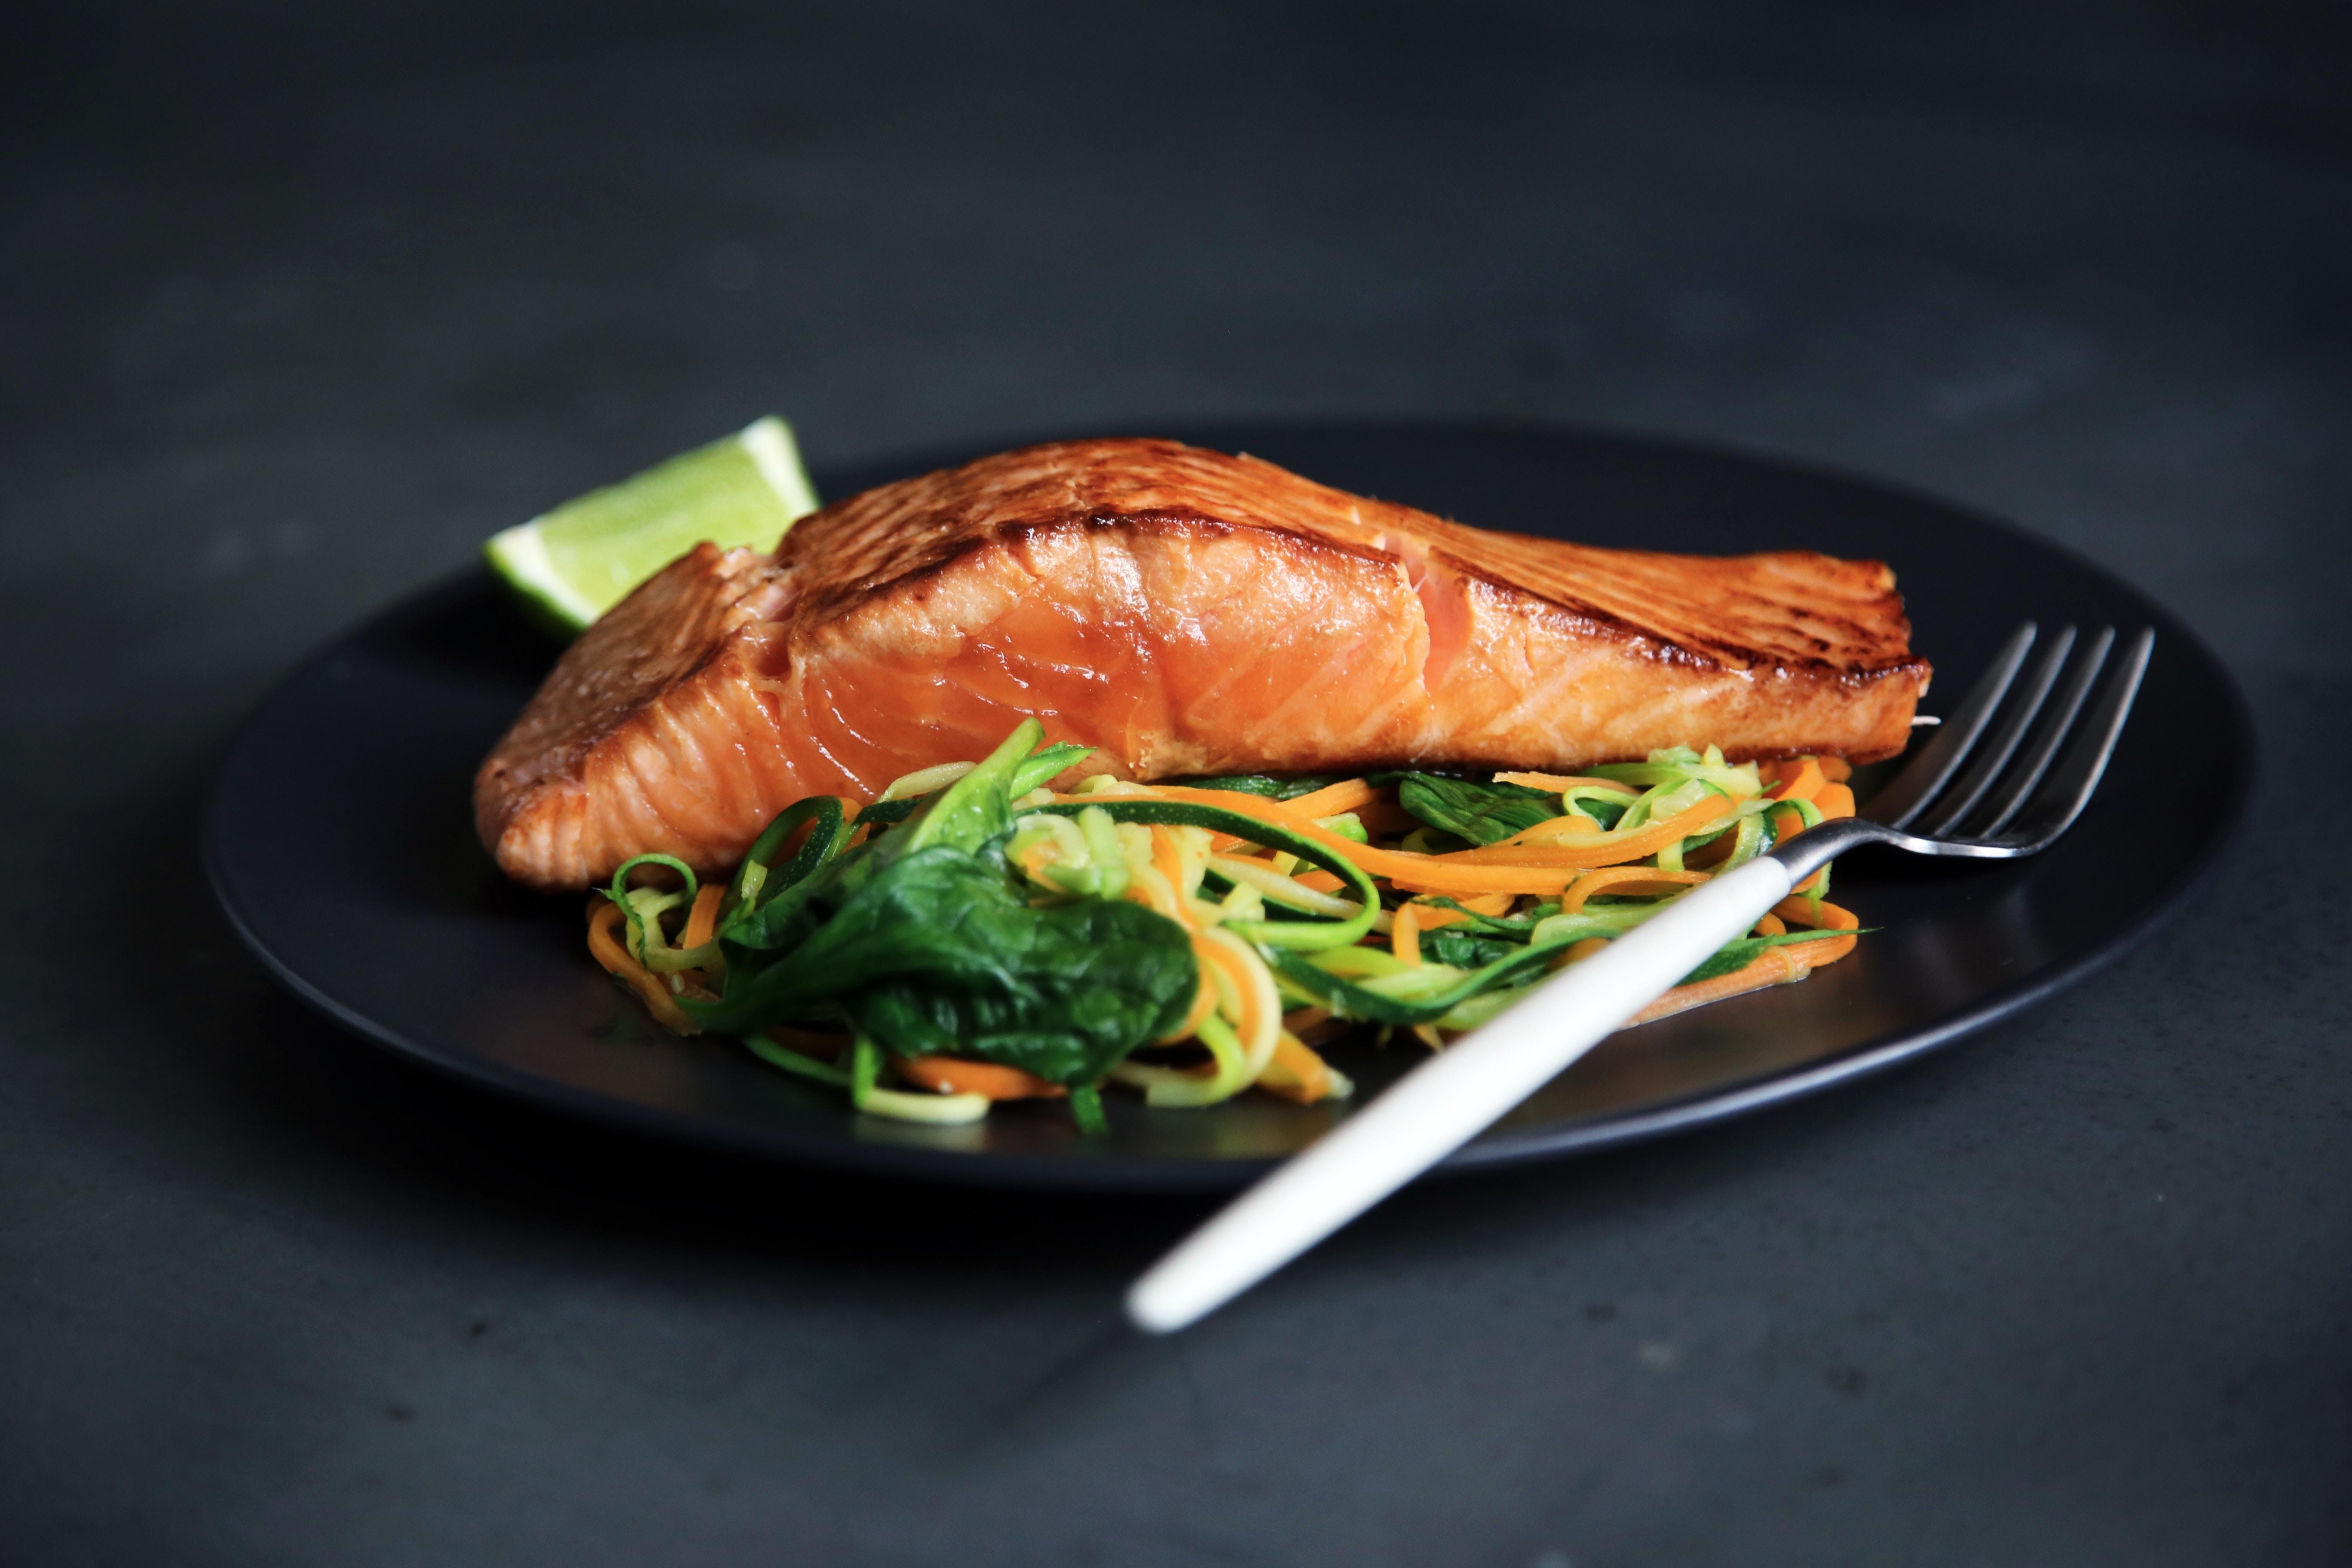 Meal of salmon and salad